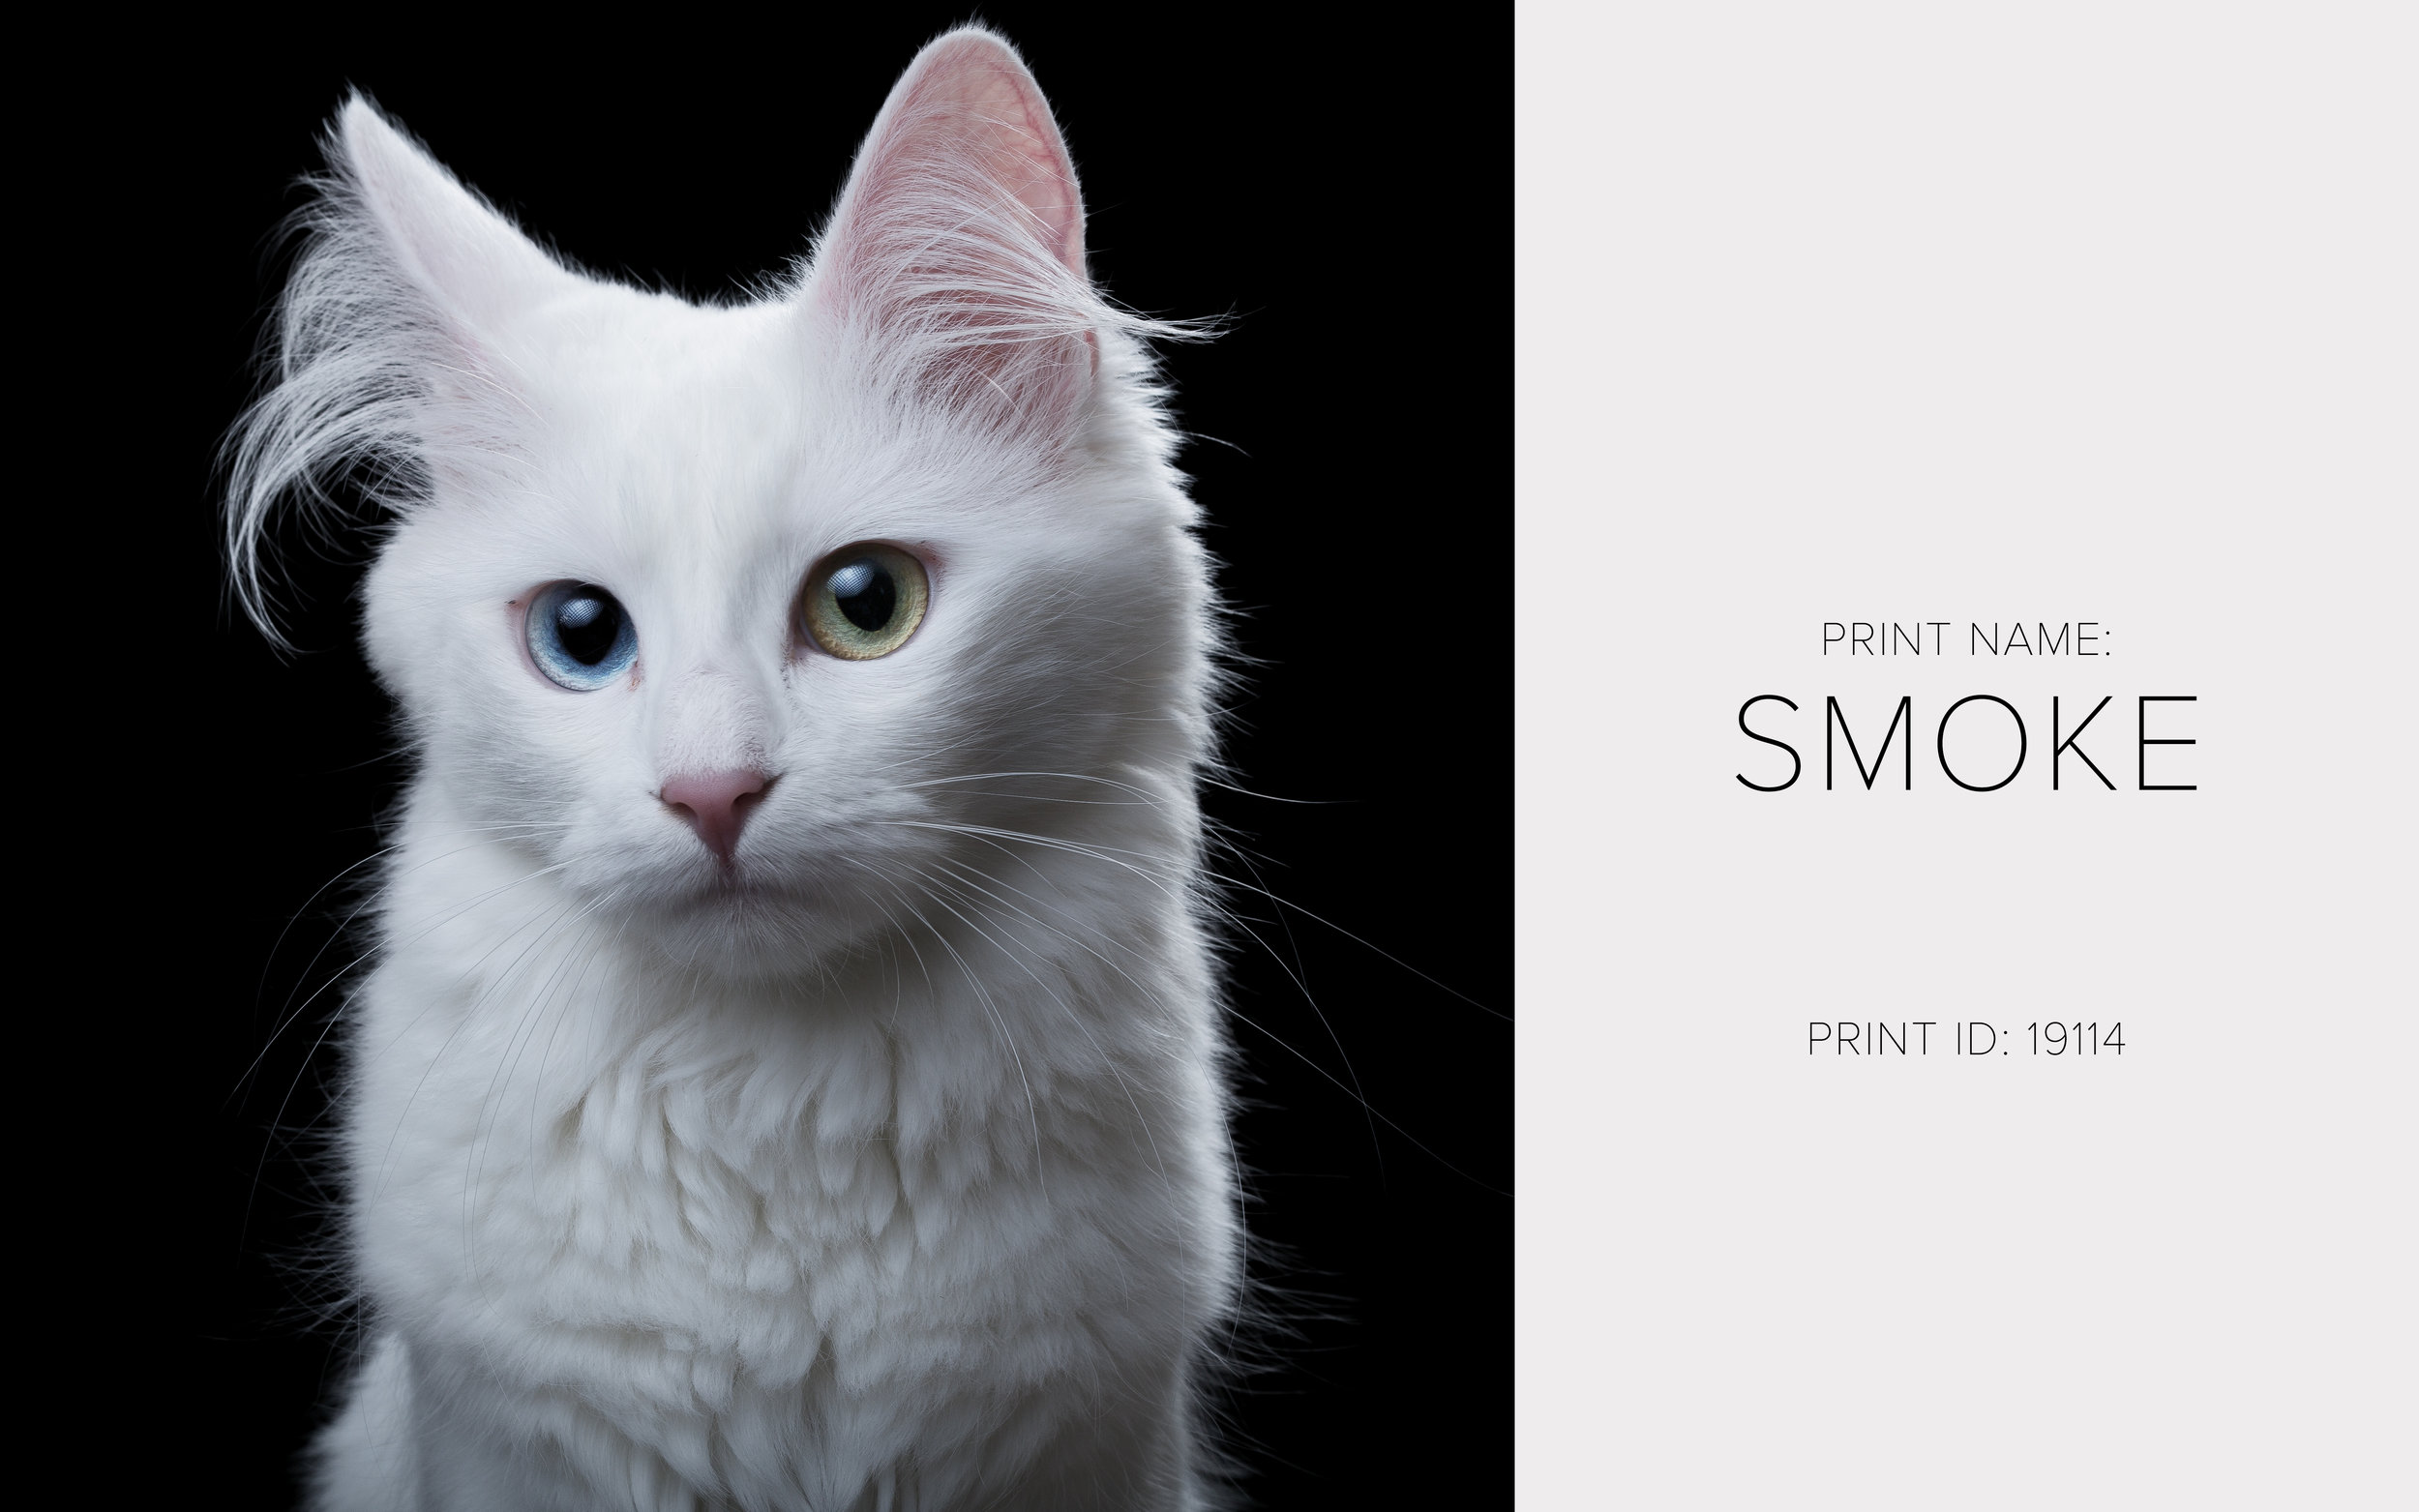 Smoke_Thumb.jpg